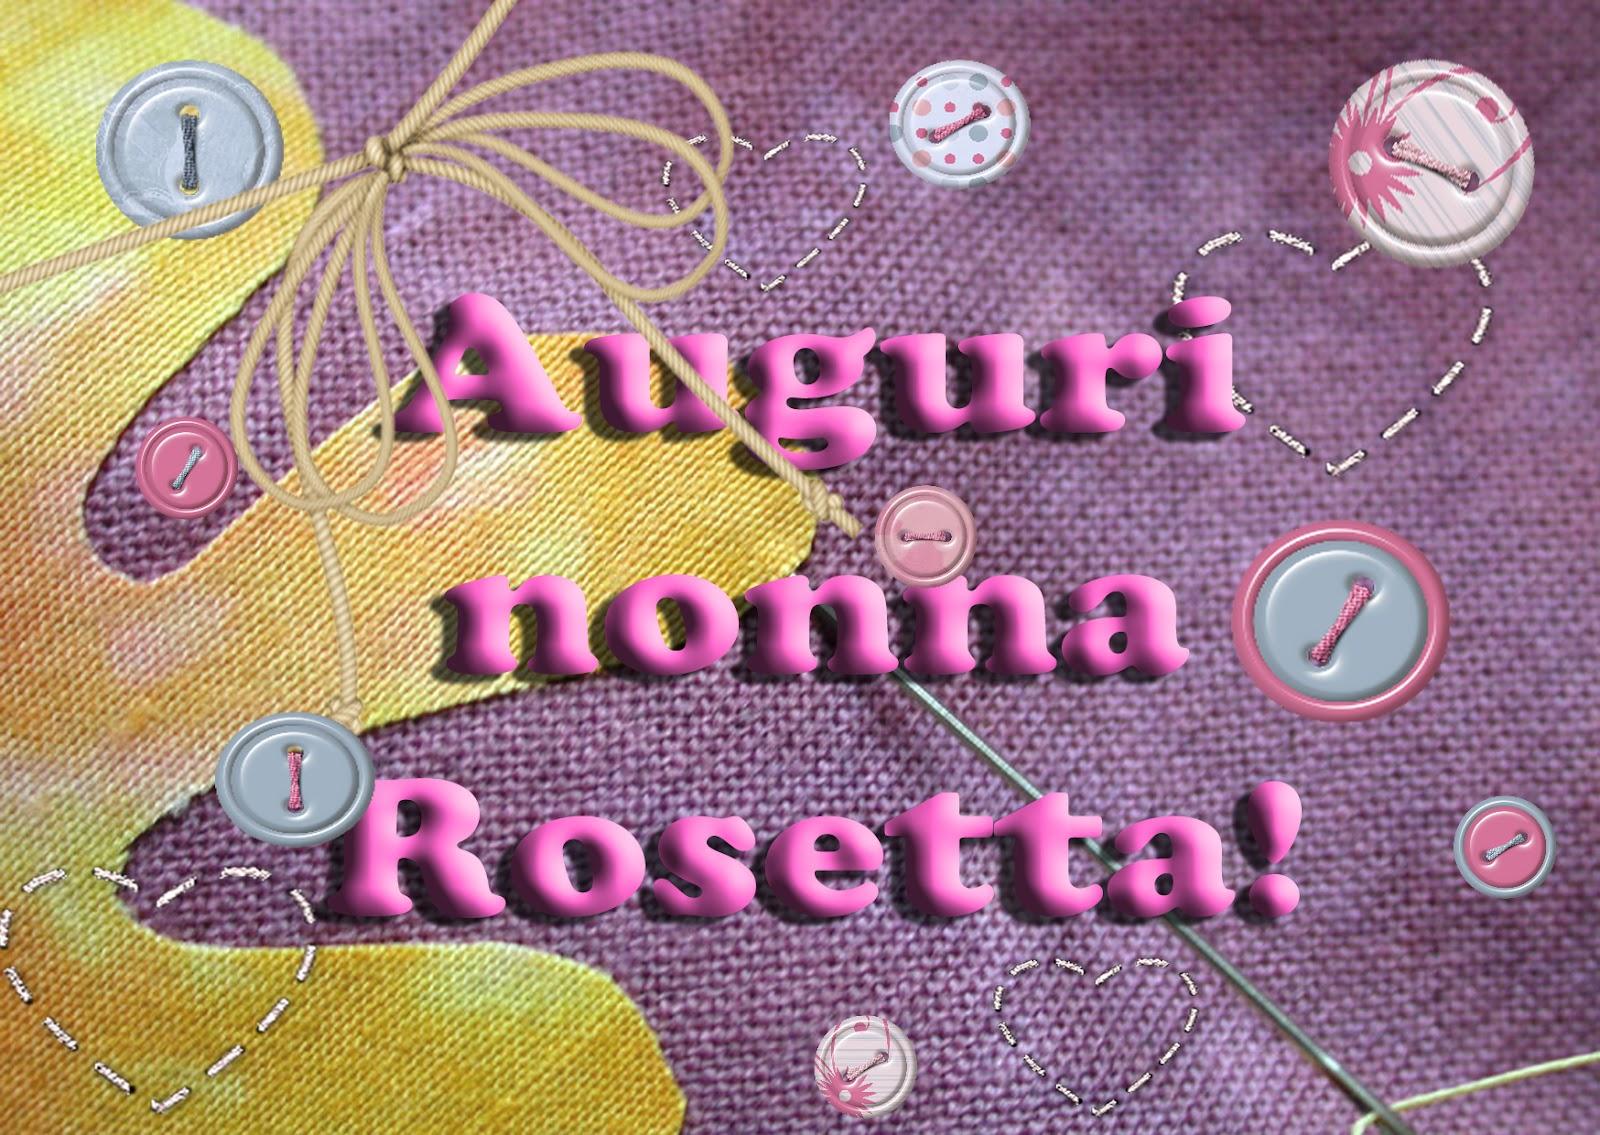 Auguri Matrimonio Nonna : Paperfarm festa dei nonni auguri nonna rosetta